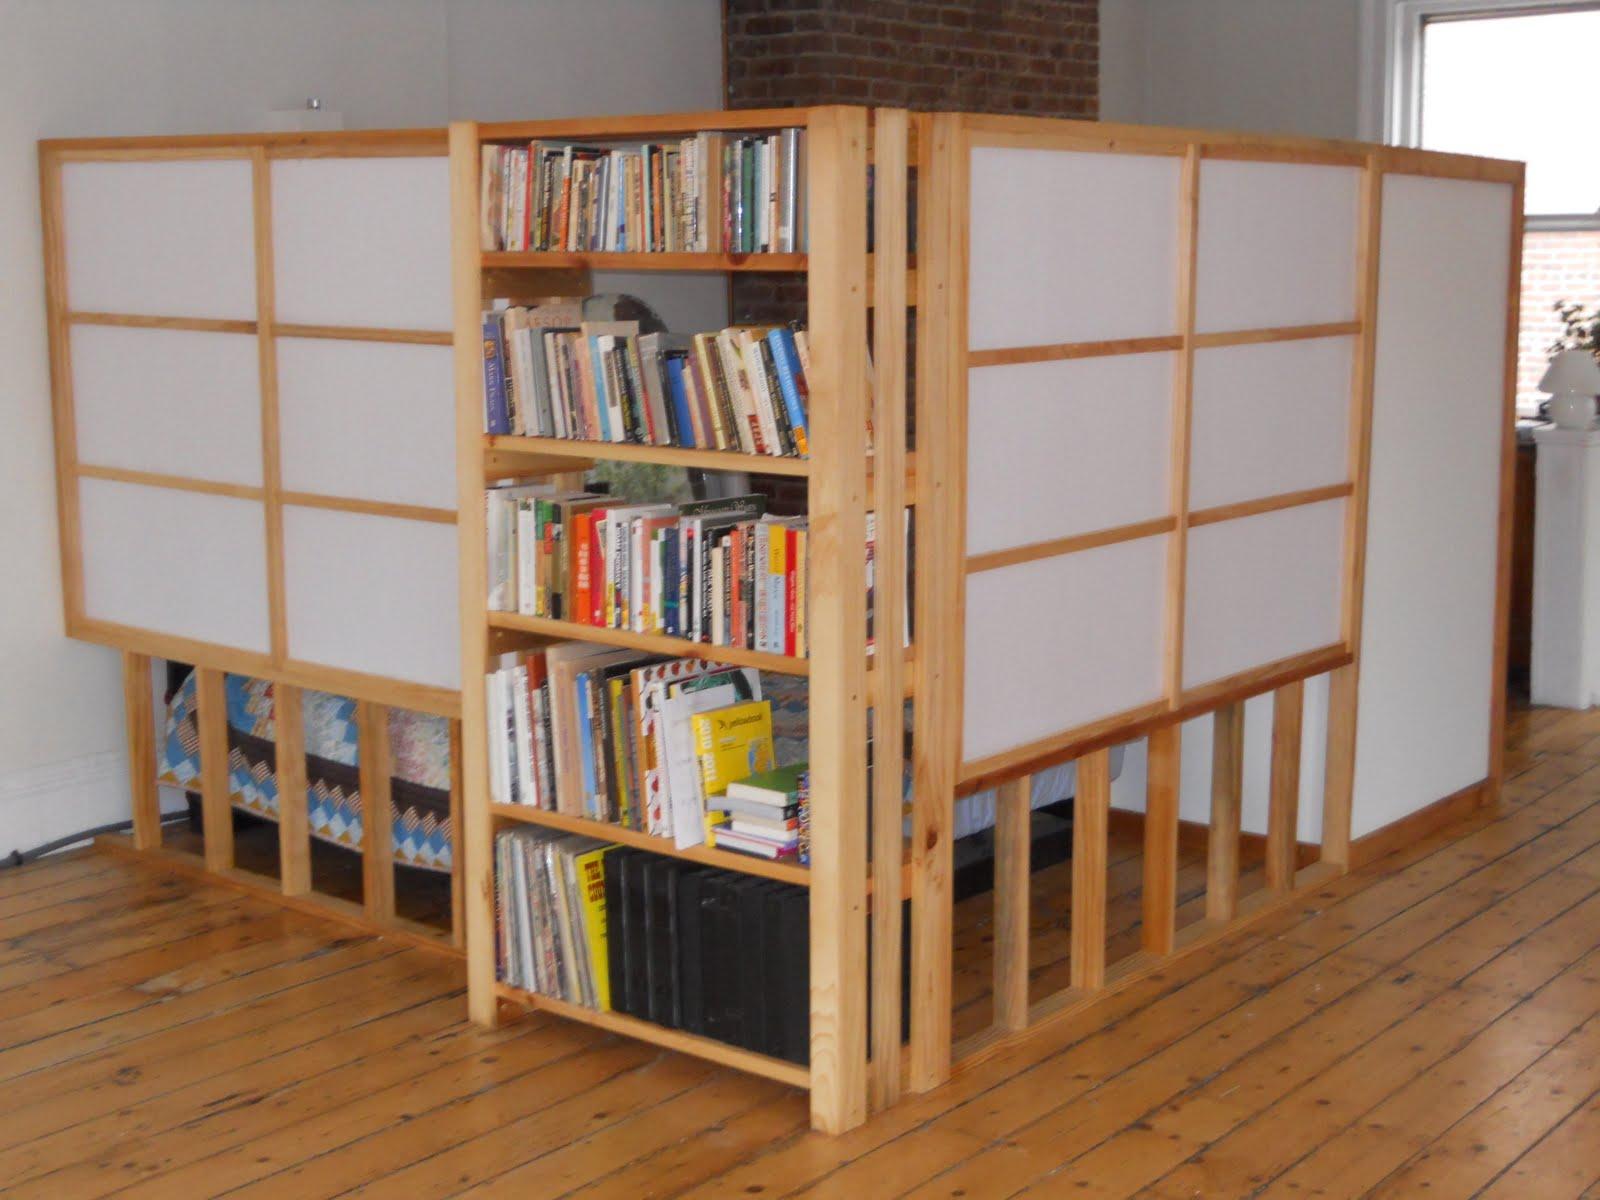 Bookshelf Room Divider Ideas